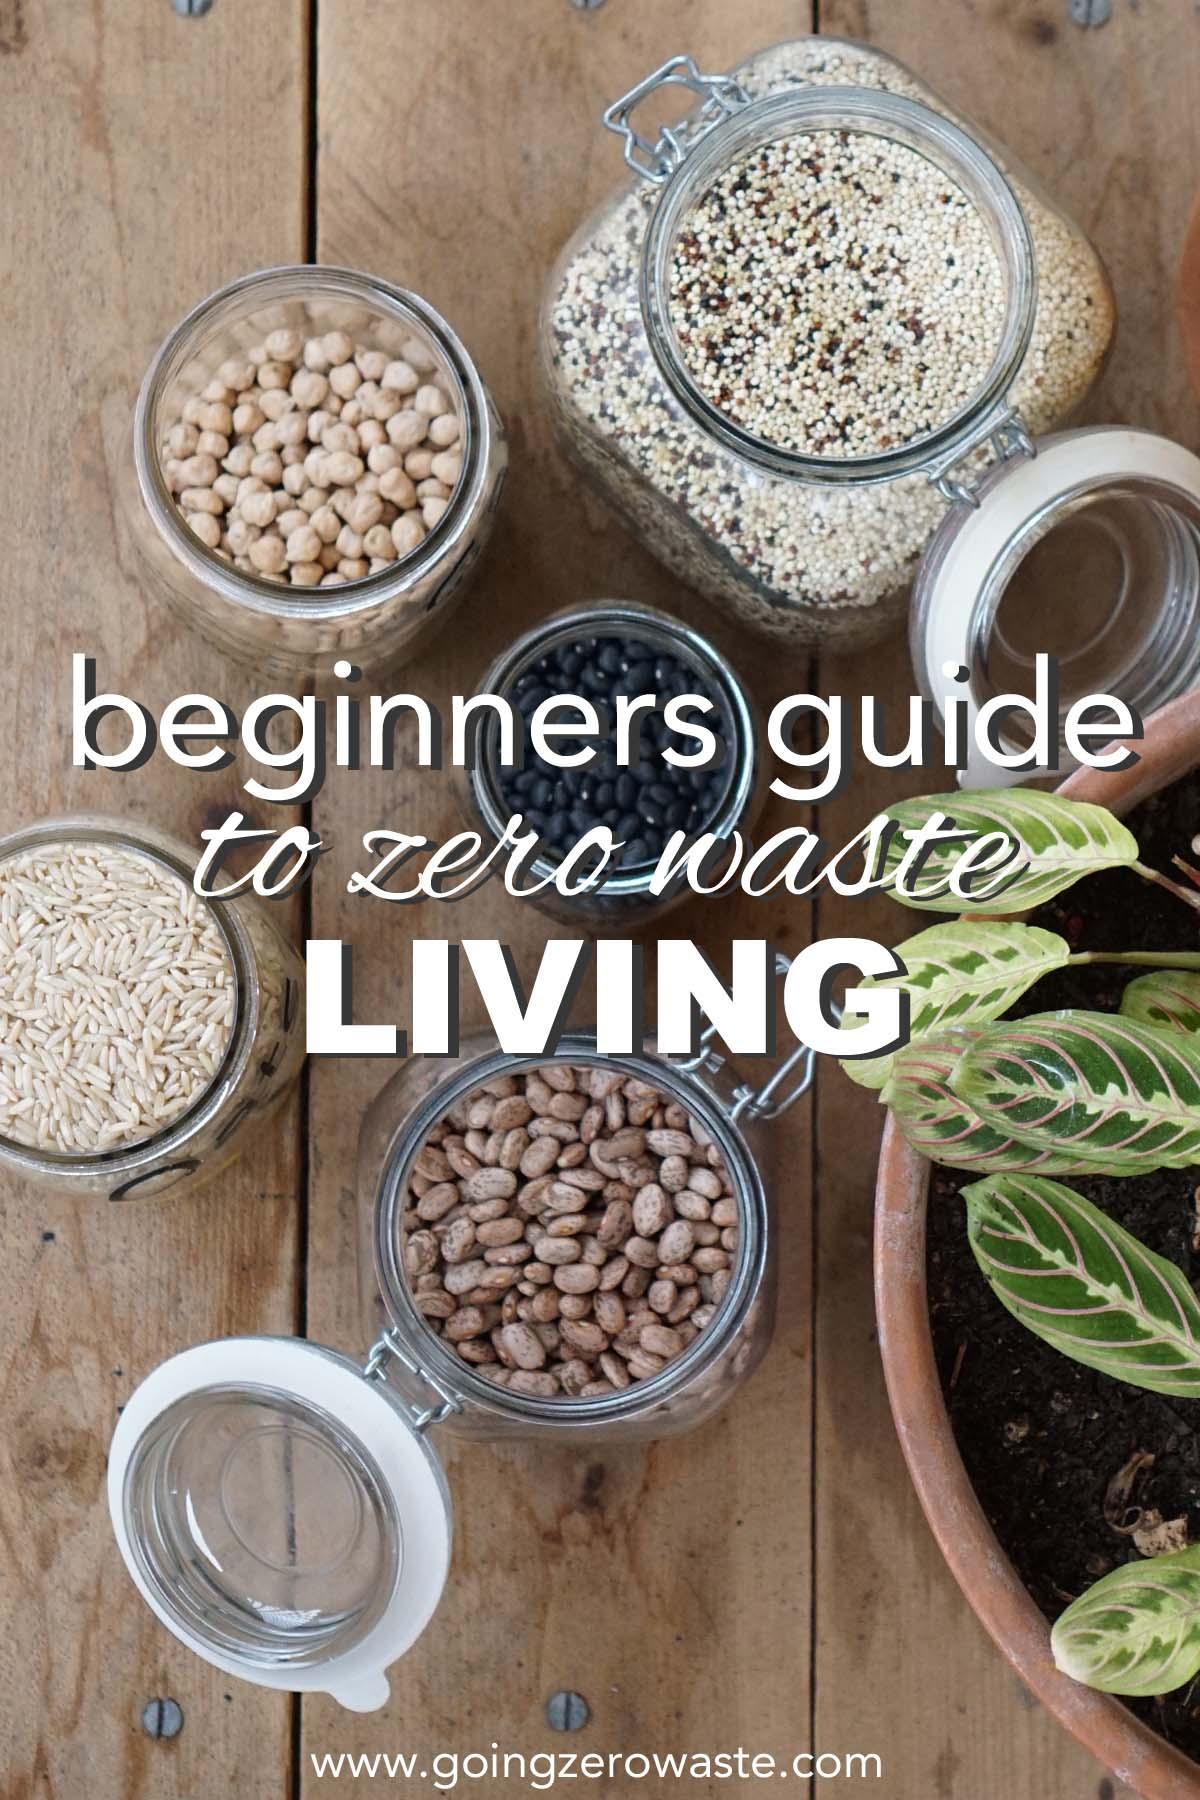 Beginners guide to zero waste living from www.goingzerowaste.com  #zerowaste #ecofriendly #gogreen #simpleliving